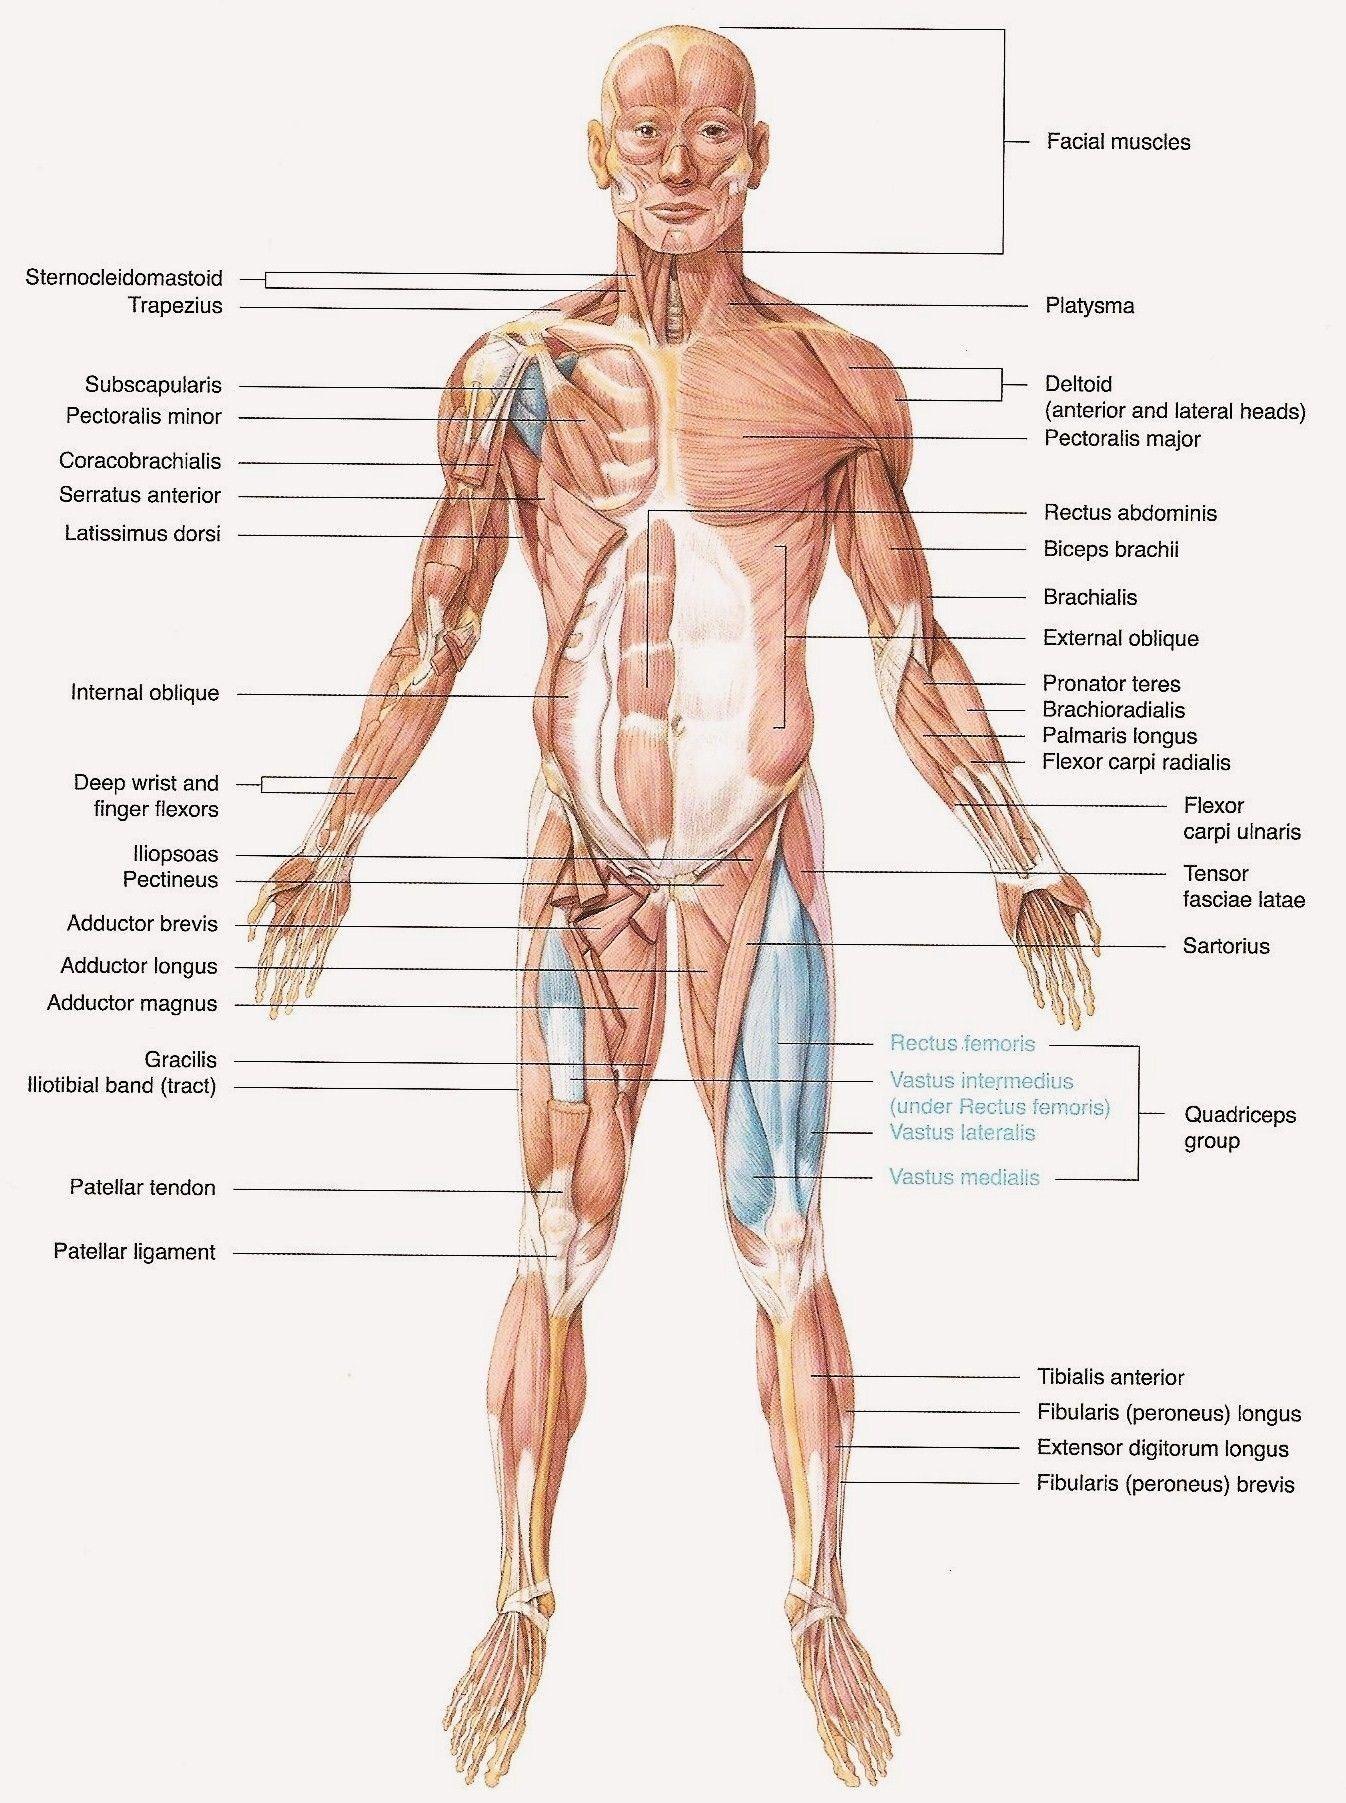 medium resolution of body diagram label schematic diagram databasebody diagram without labels wiring diagrams konsult golgi body diagram labeled